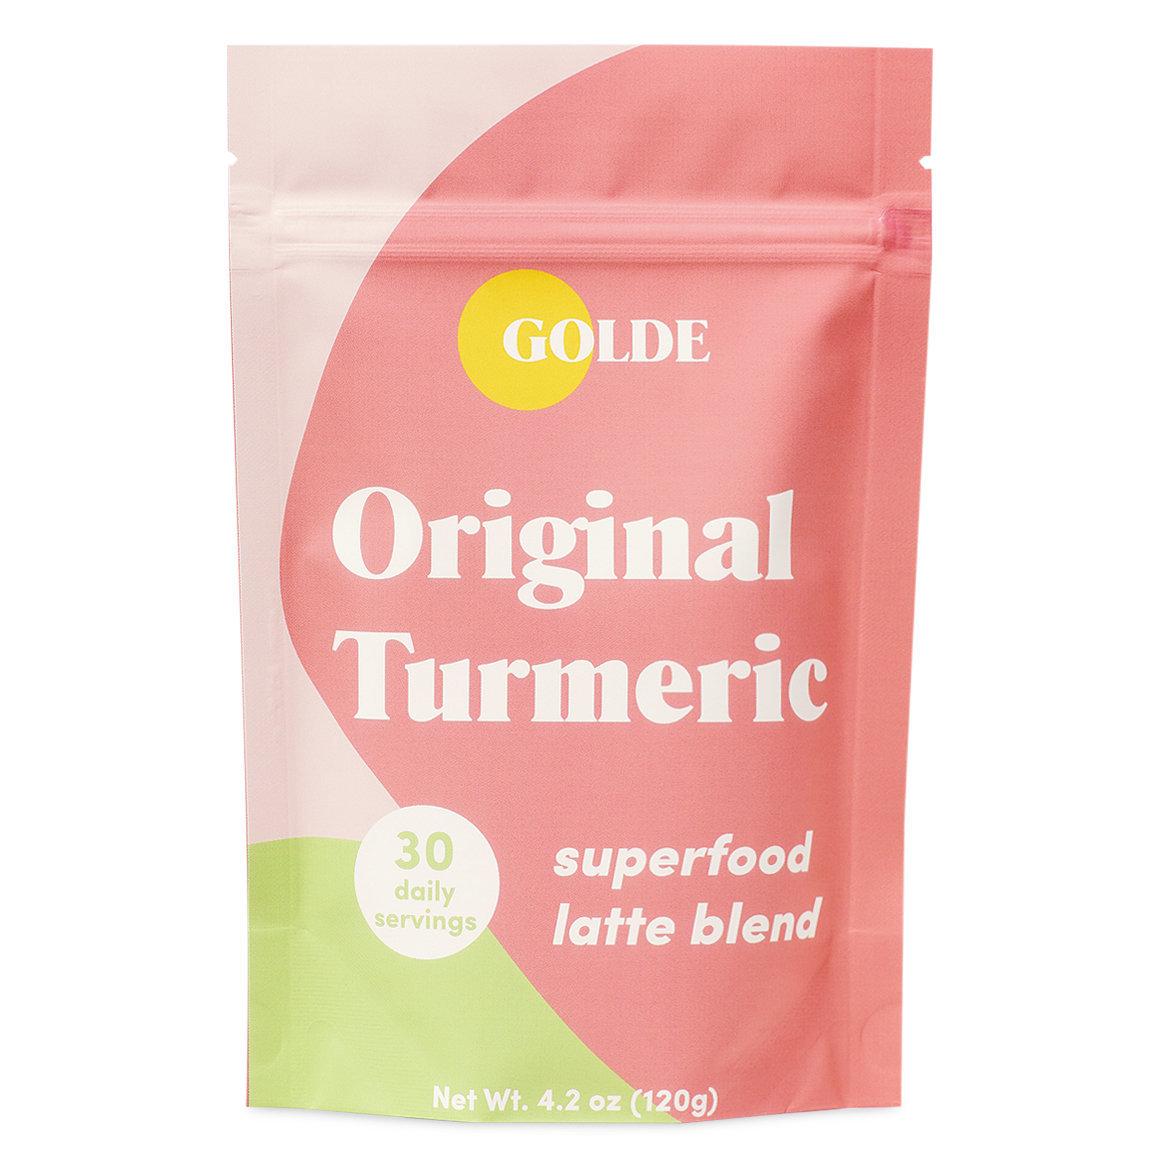 Golde Original Turmeric Latte Blend alternative view 1 - product swatch.